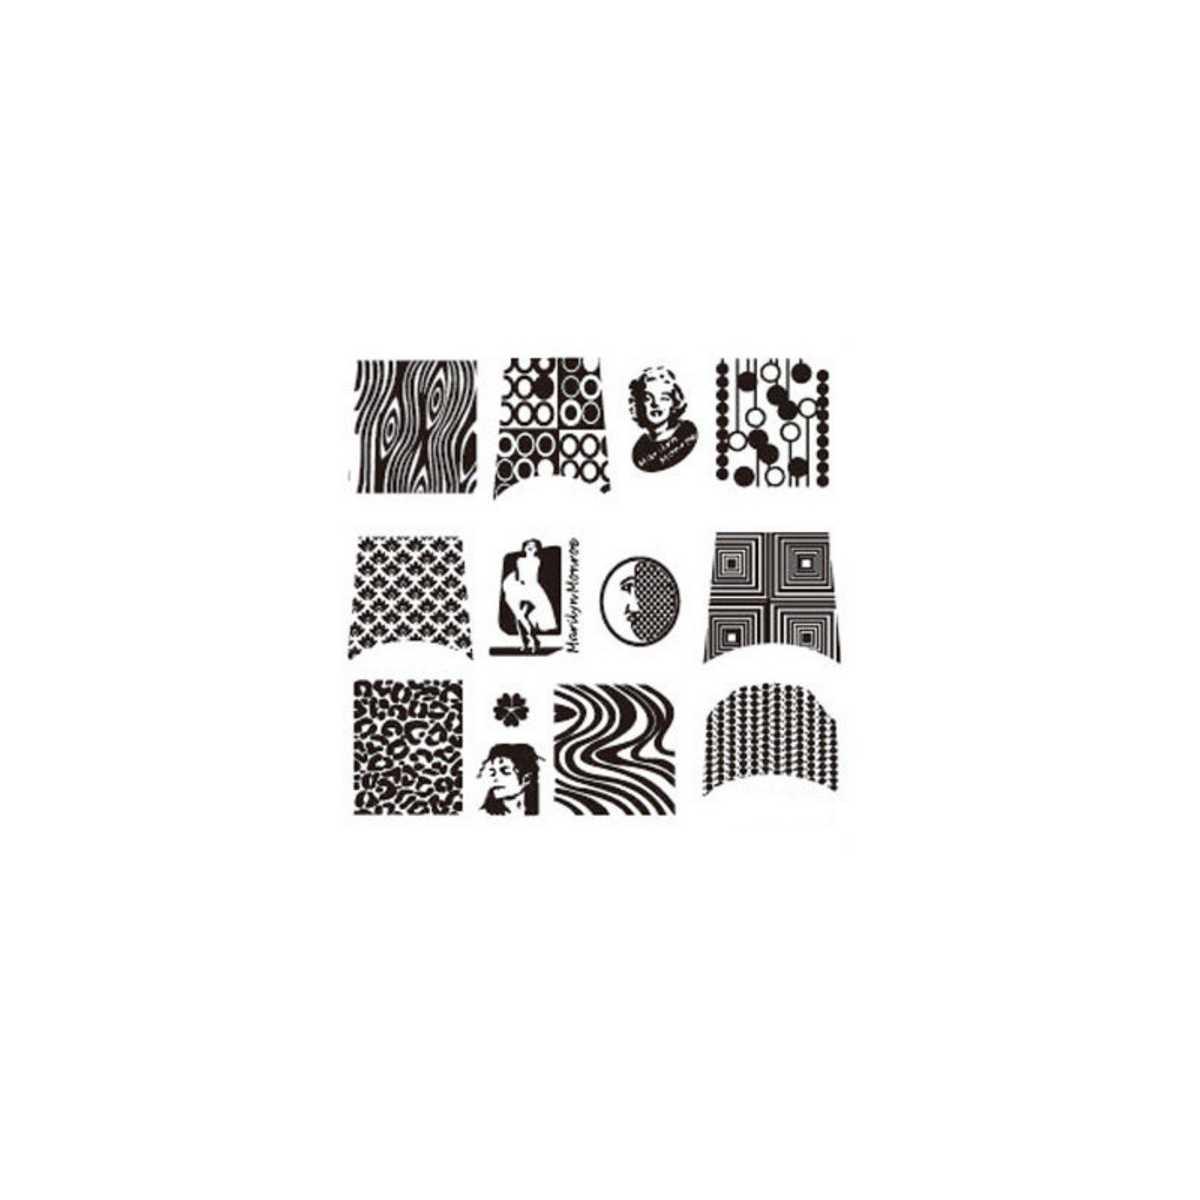 https://www.kit-manucure.com/1044-thickbox_default/plaque-de-stamping-motif-integral-marilyne-monroe-et-léopard.jpg